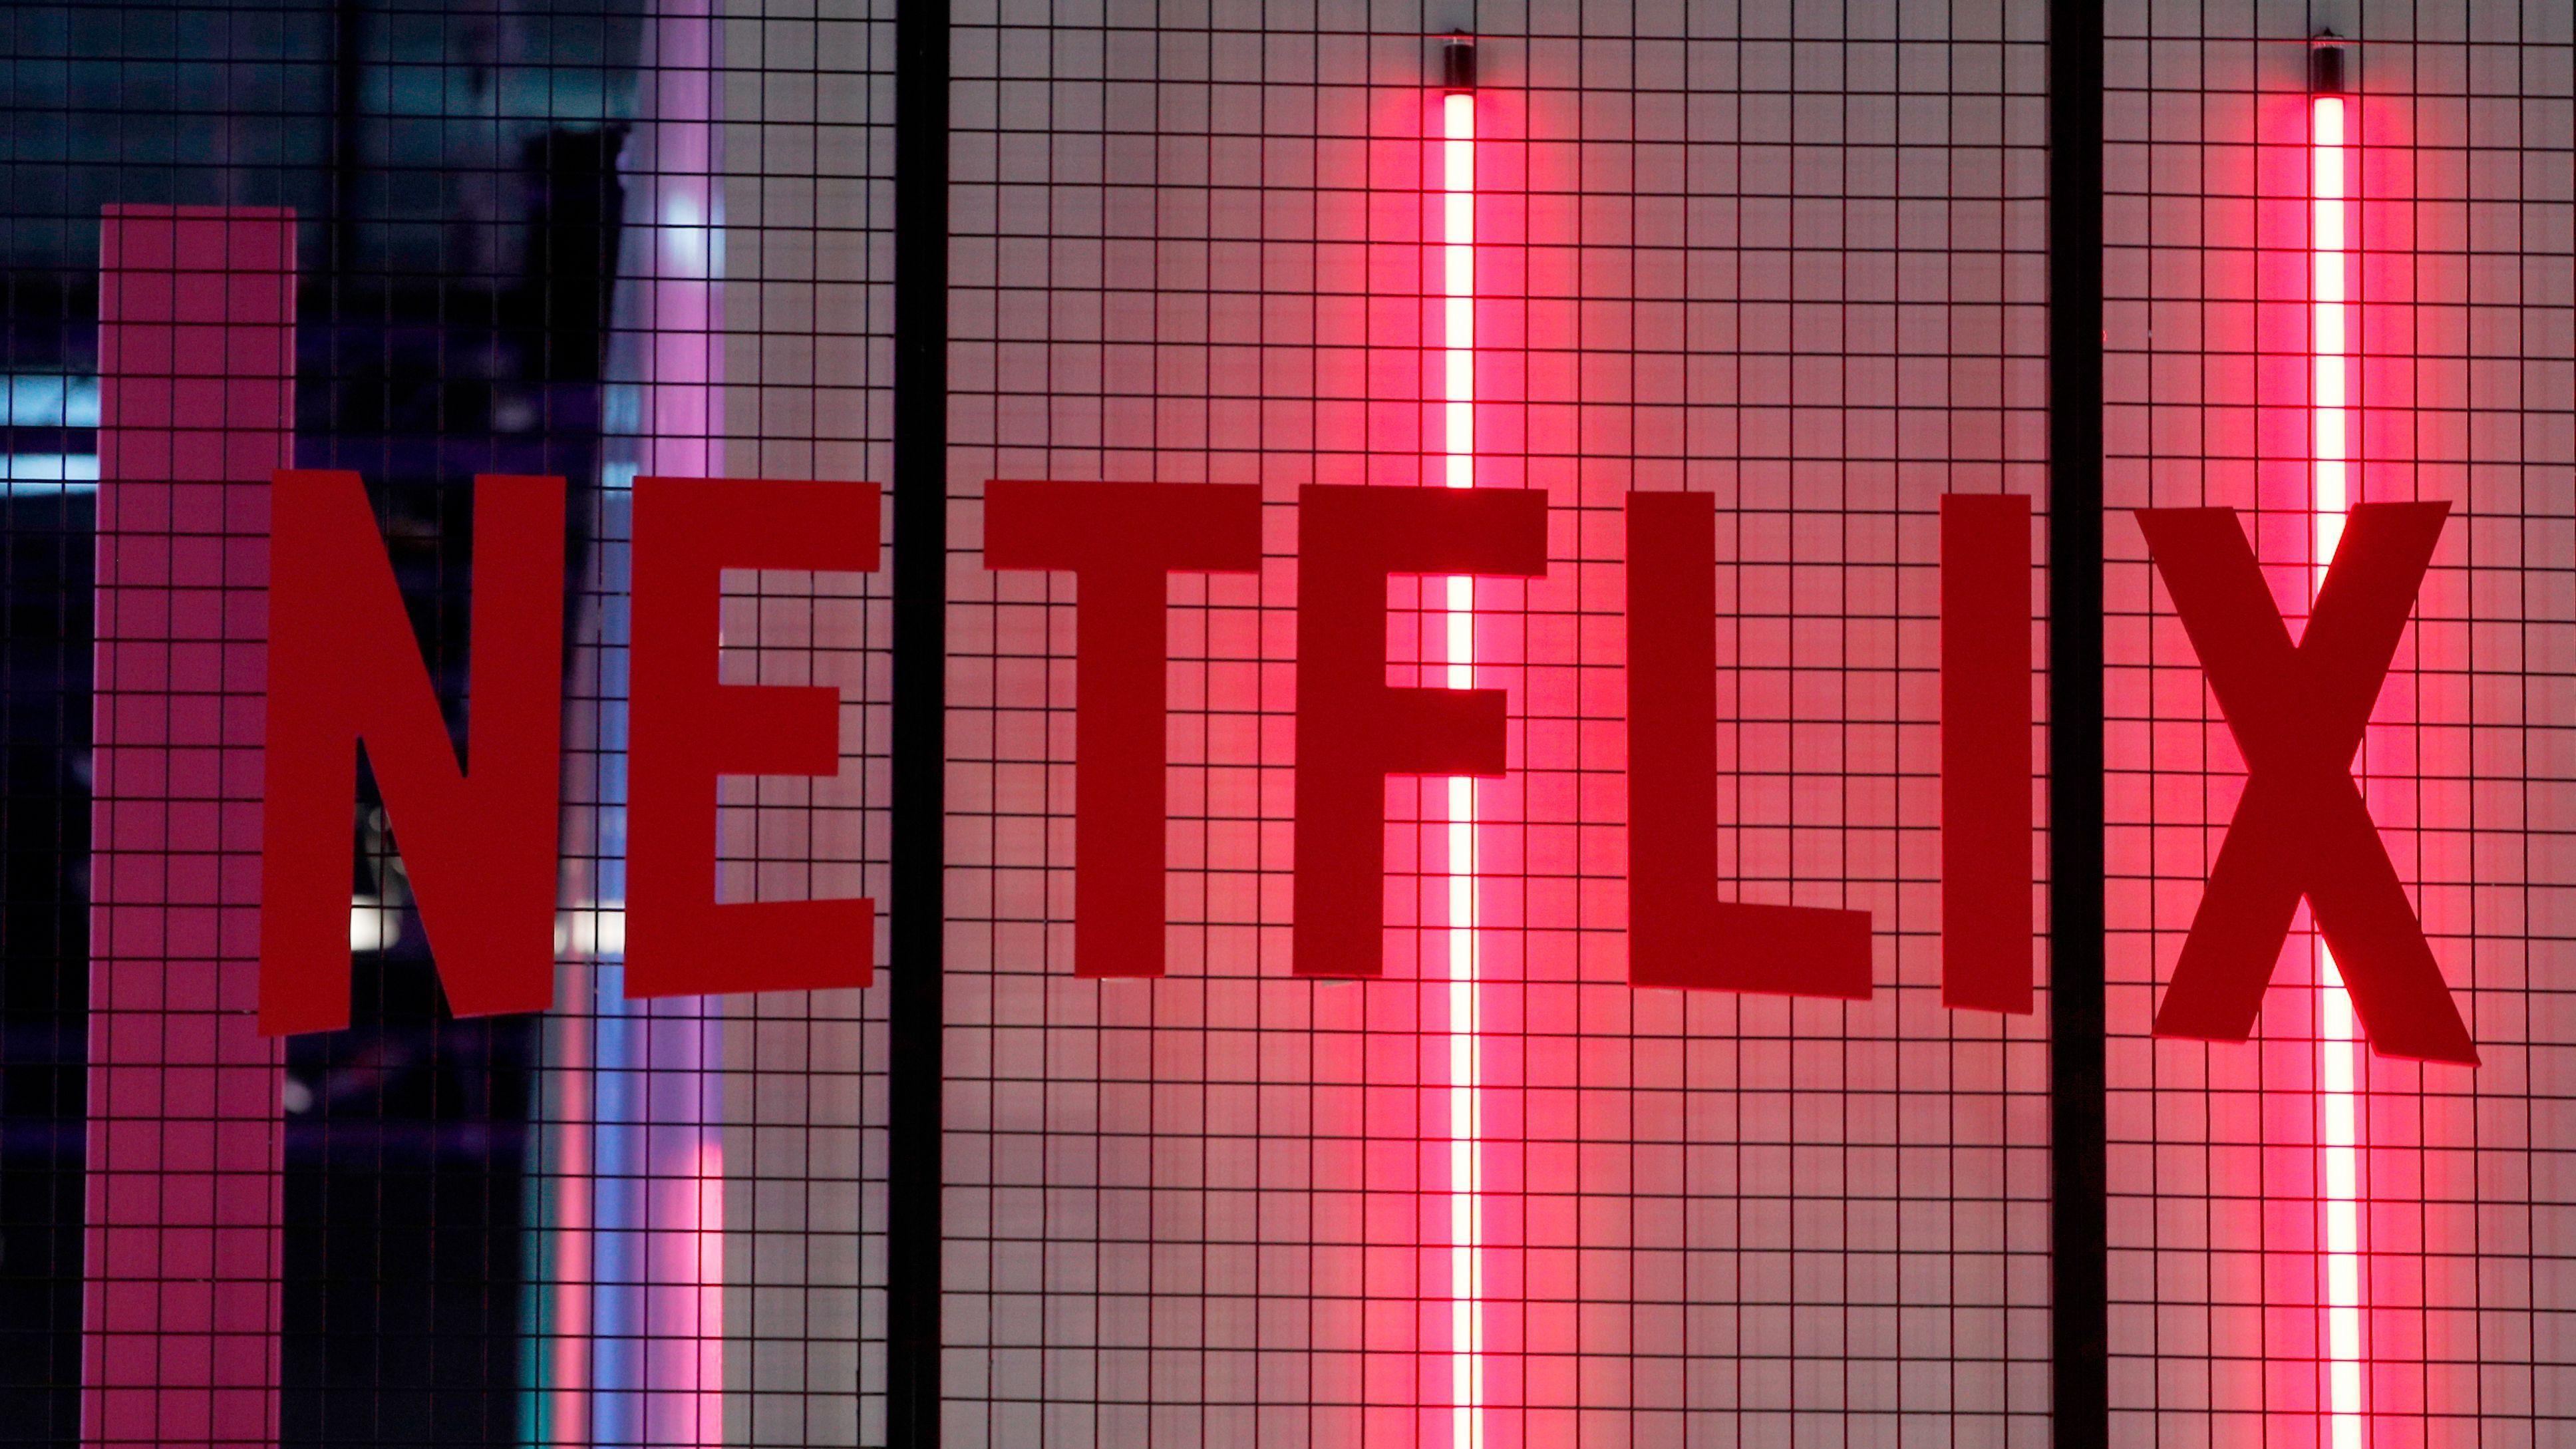 Netflix (NFLX) stock plunges after Q2 earnings slowdown — Quartz